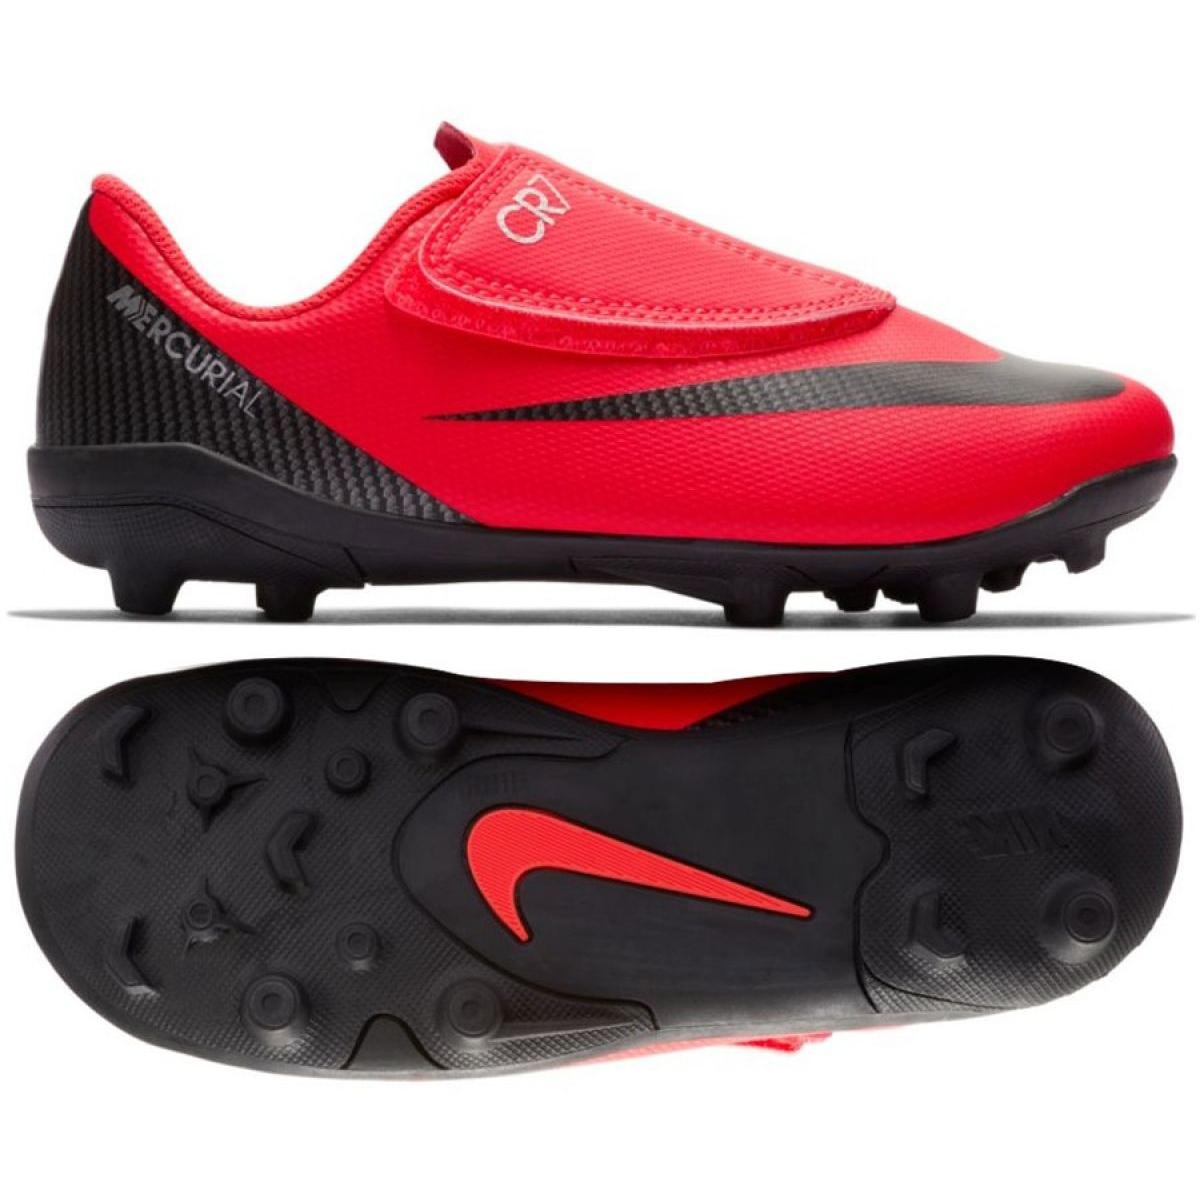 best service a665e 9eae4 Nike Mercurial Vapor 12 Club Shoes Ps V CR7 Mg Jr AJ3096-600